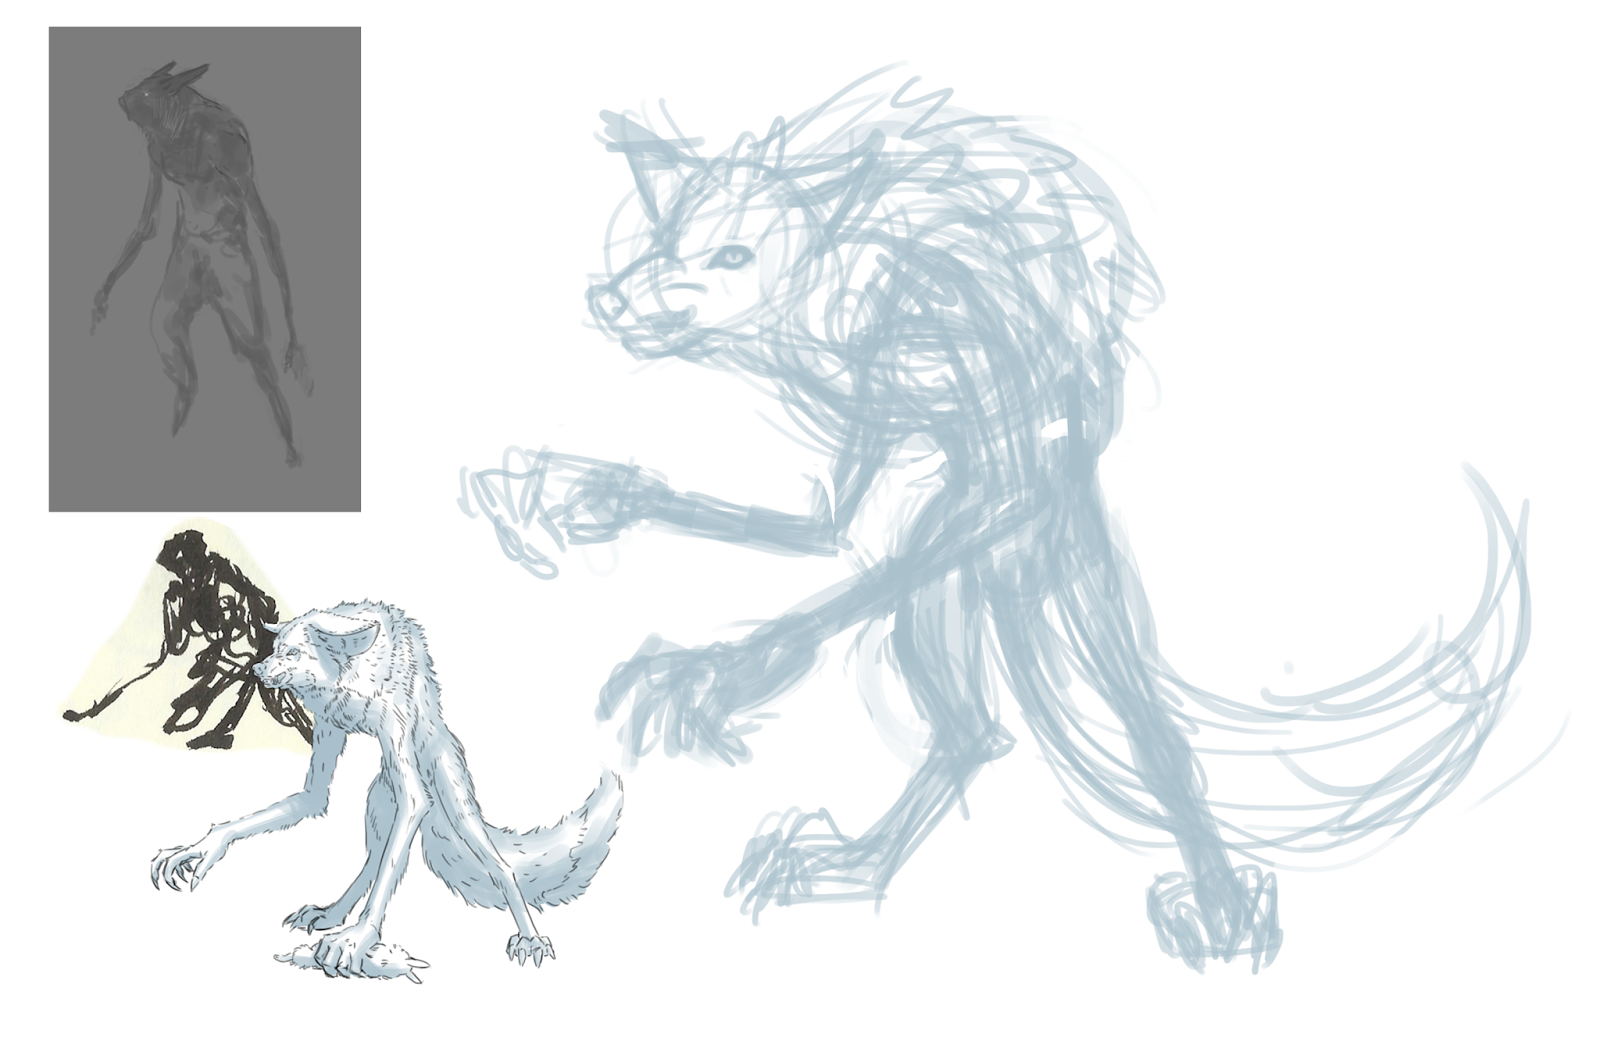 [Image: 2017_05_10_werewolf2.png]